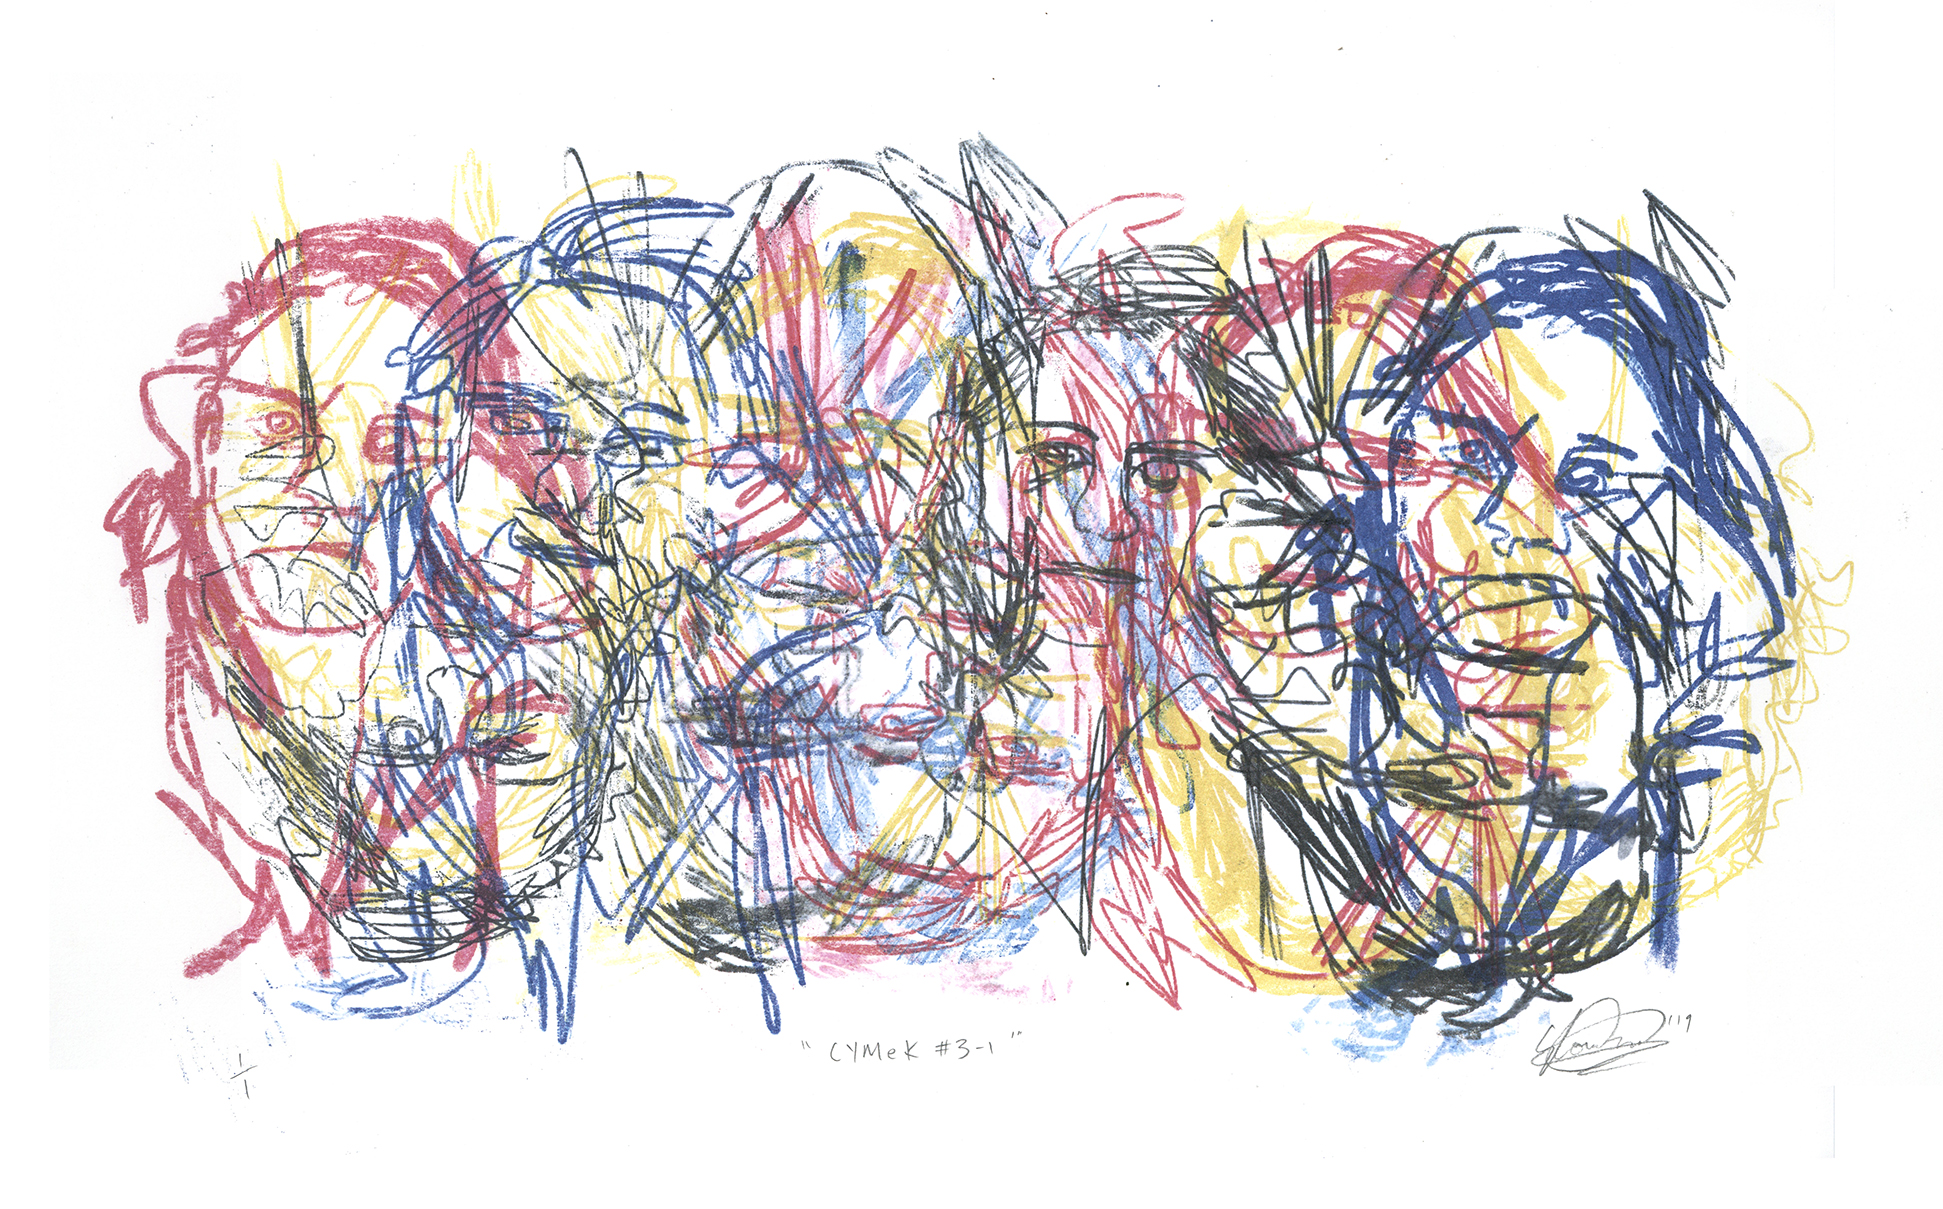 CYMeK # 3-1. Monoprint on Paper. 54cm x 39cm. 2019